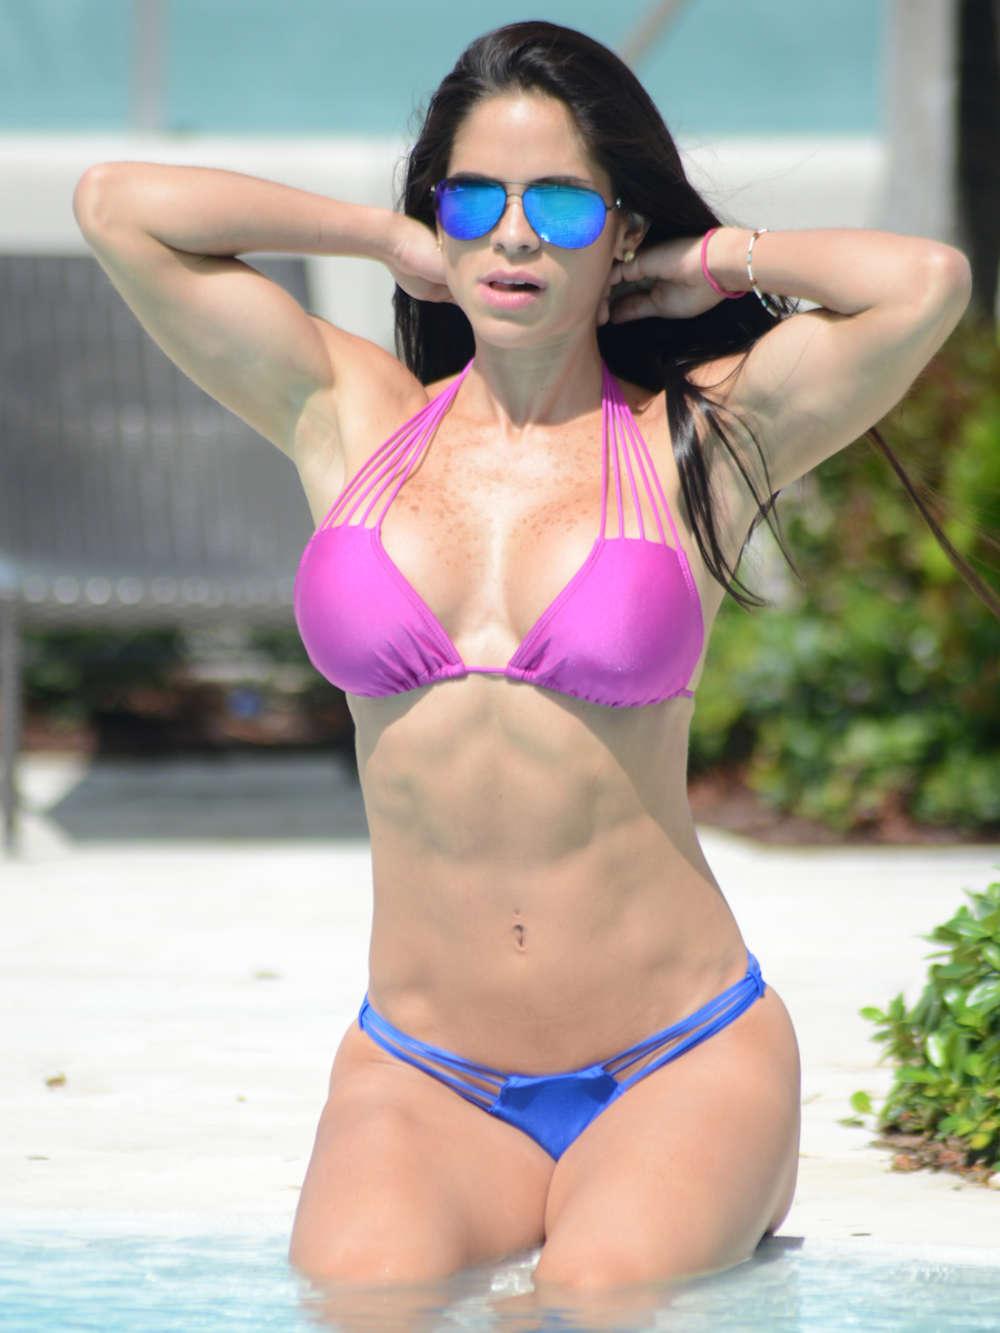 Bikini Michelle Lewin naked (98 photos), Sexy, Paparazzi, Selfie, swimsuit 2018